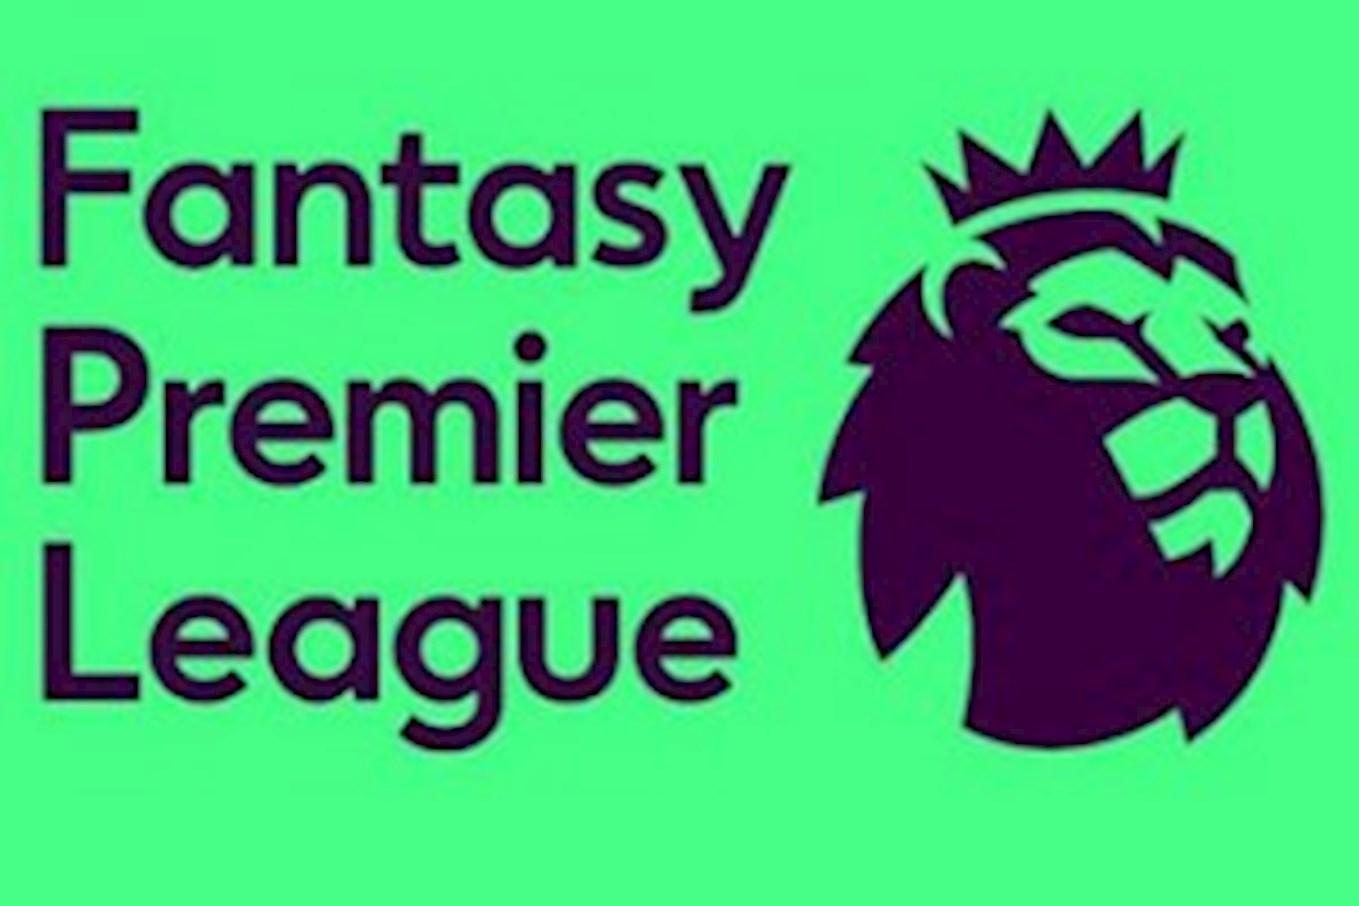 Fantasy Football update - Month one winner! - News